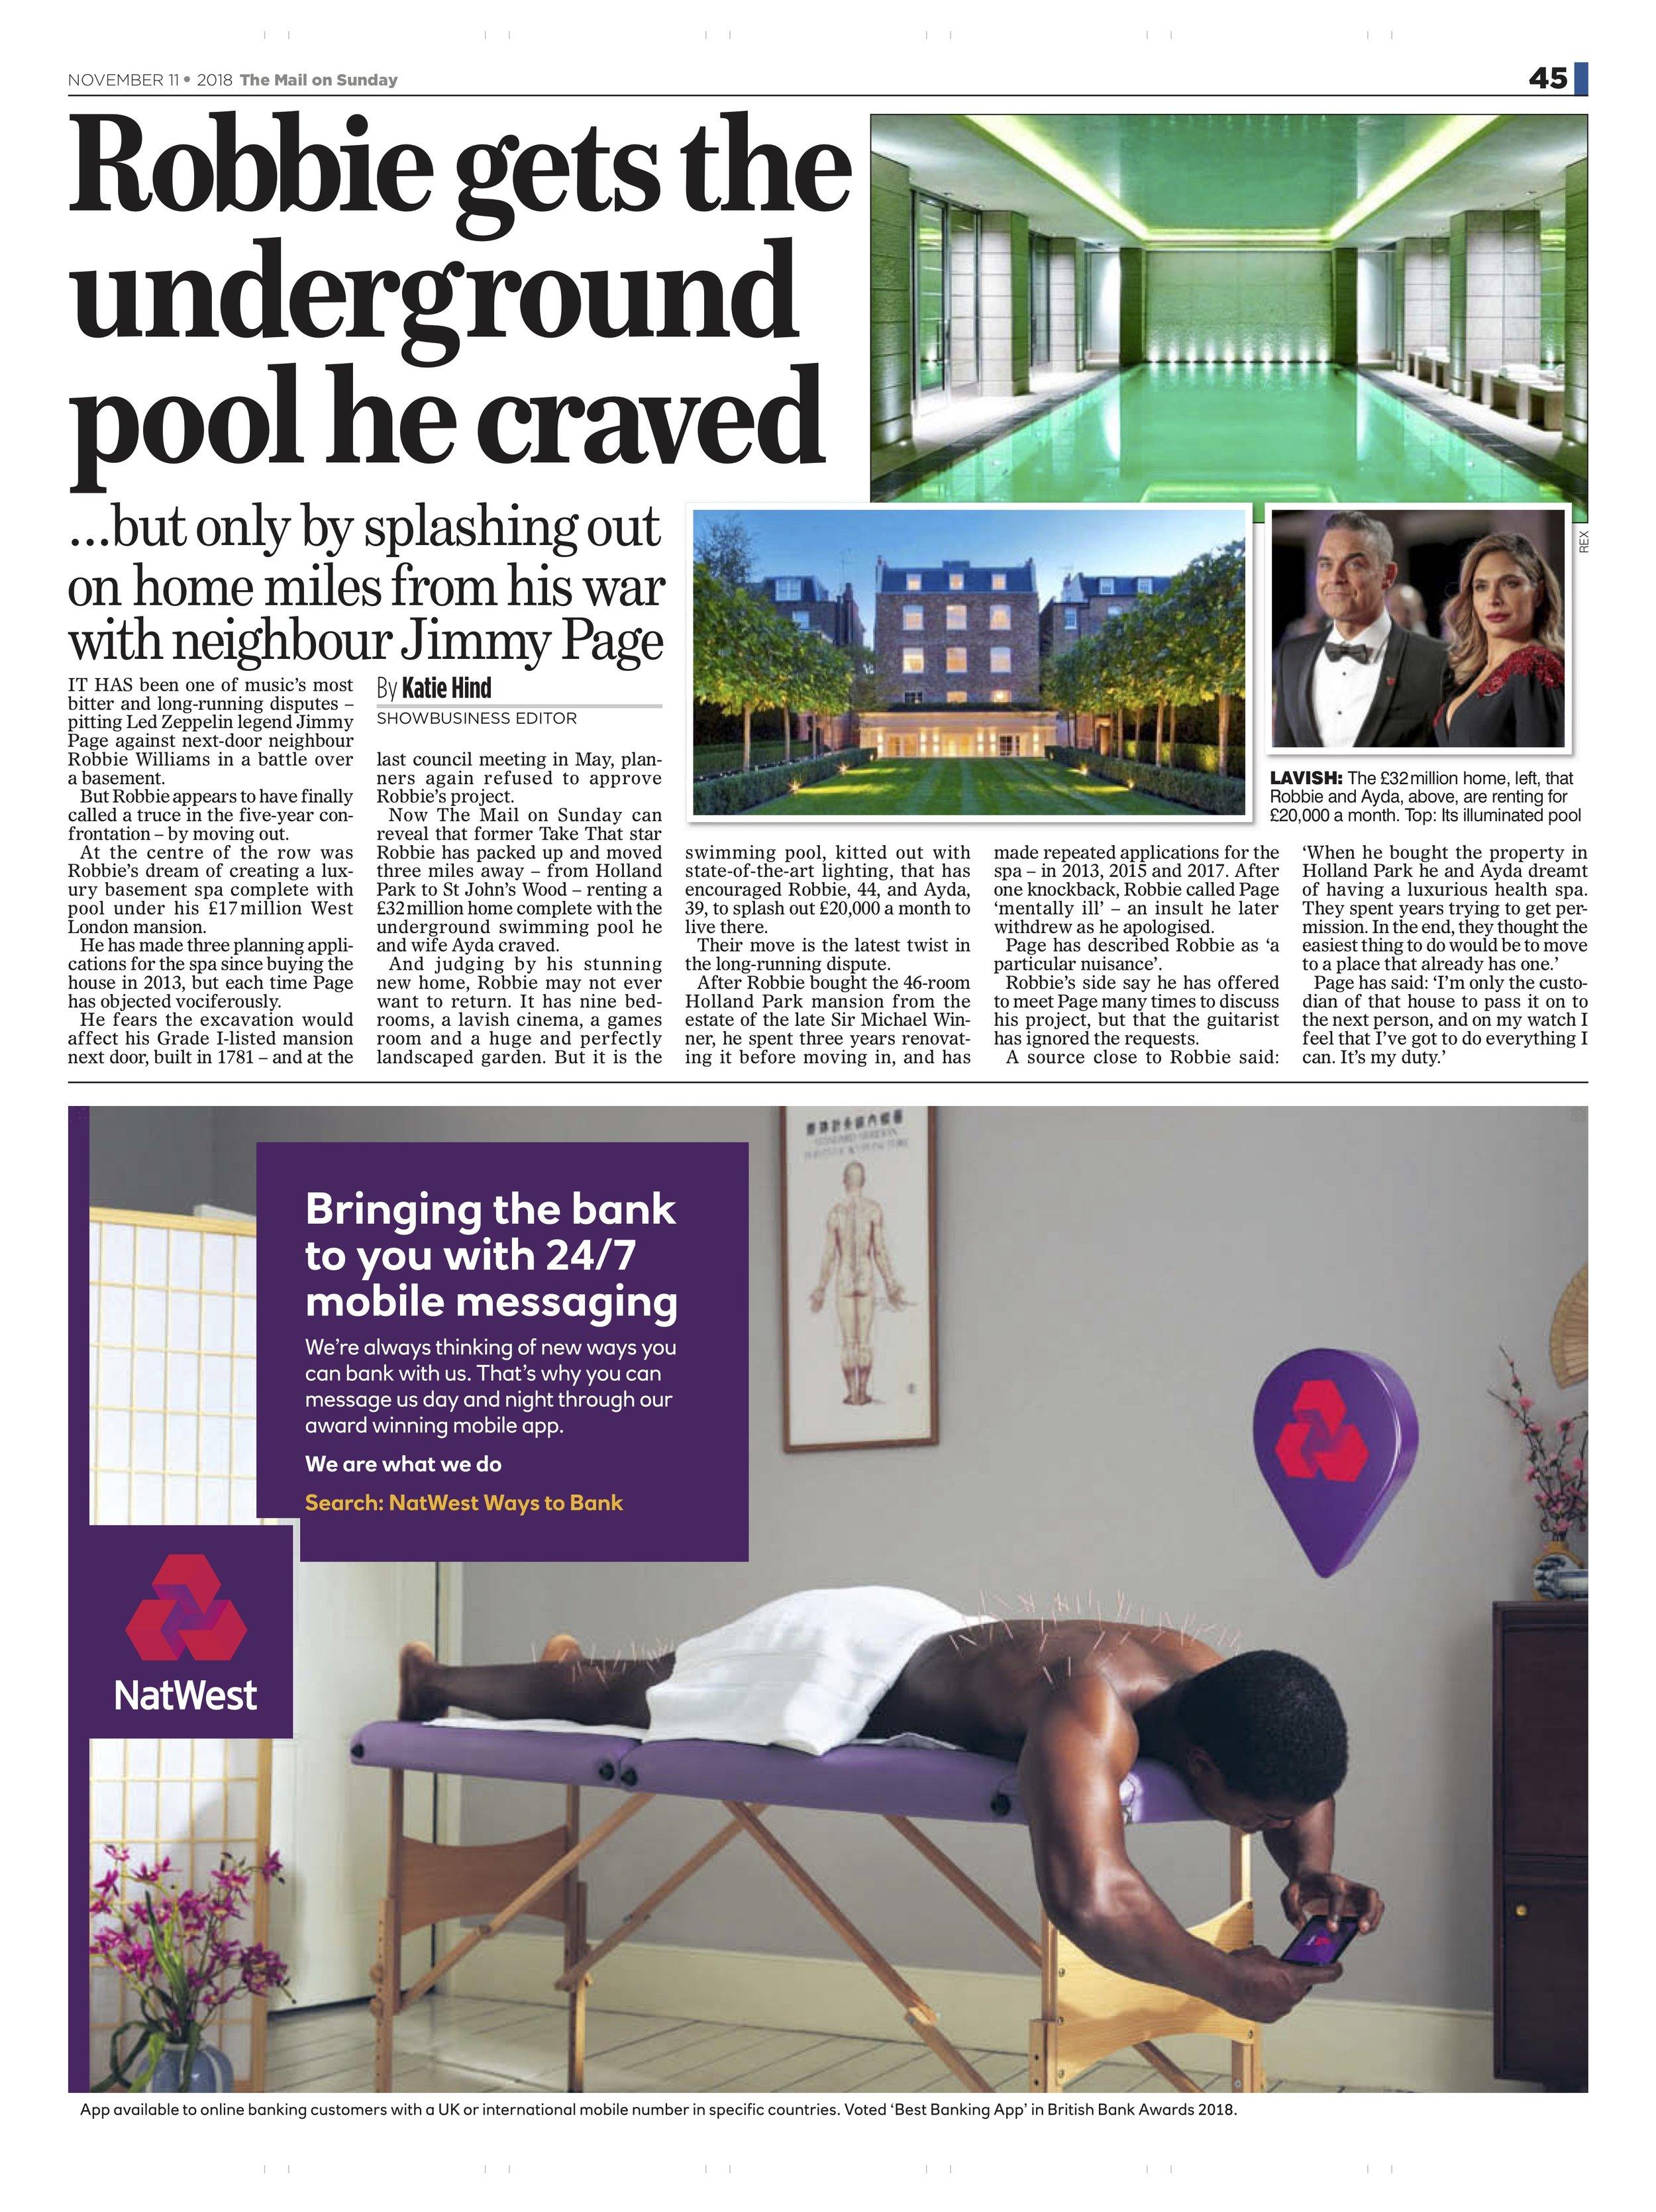 Robbie Williams / Mail on Sunday